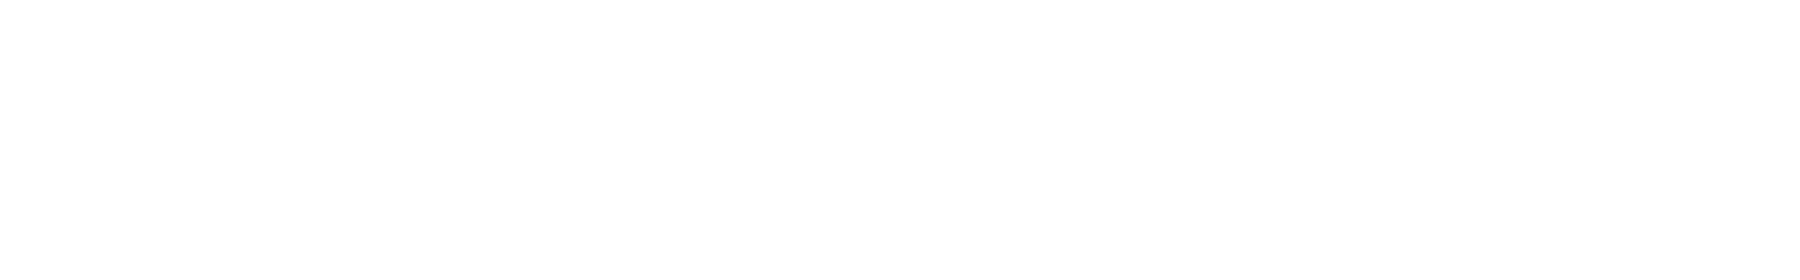 ehp synloop 127 glitchpadvox d